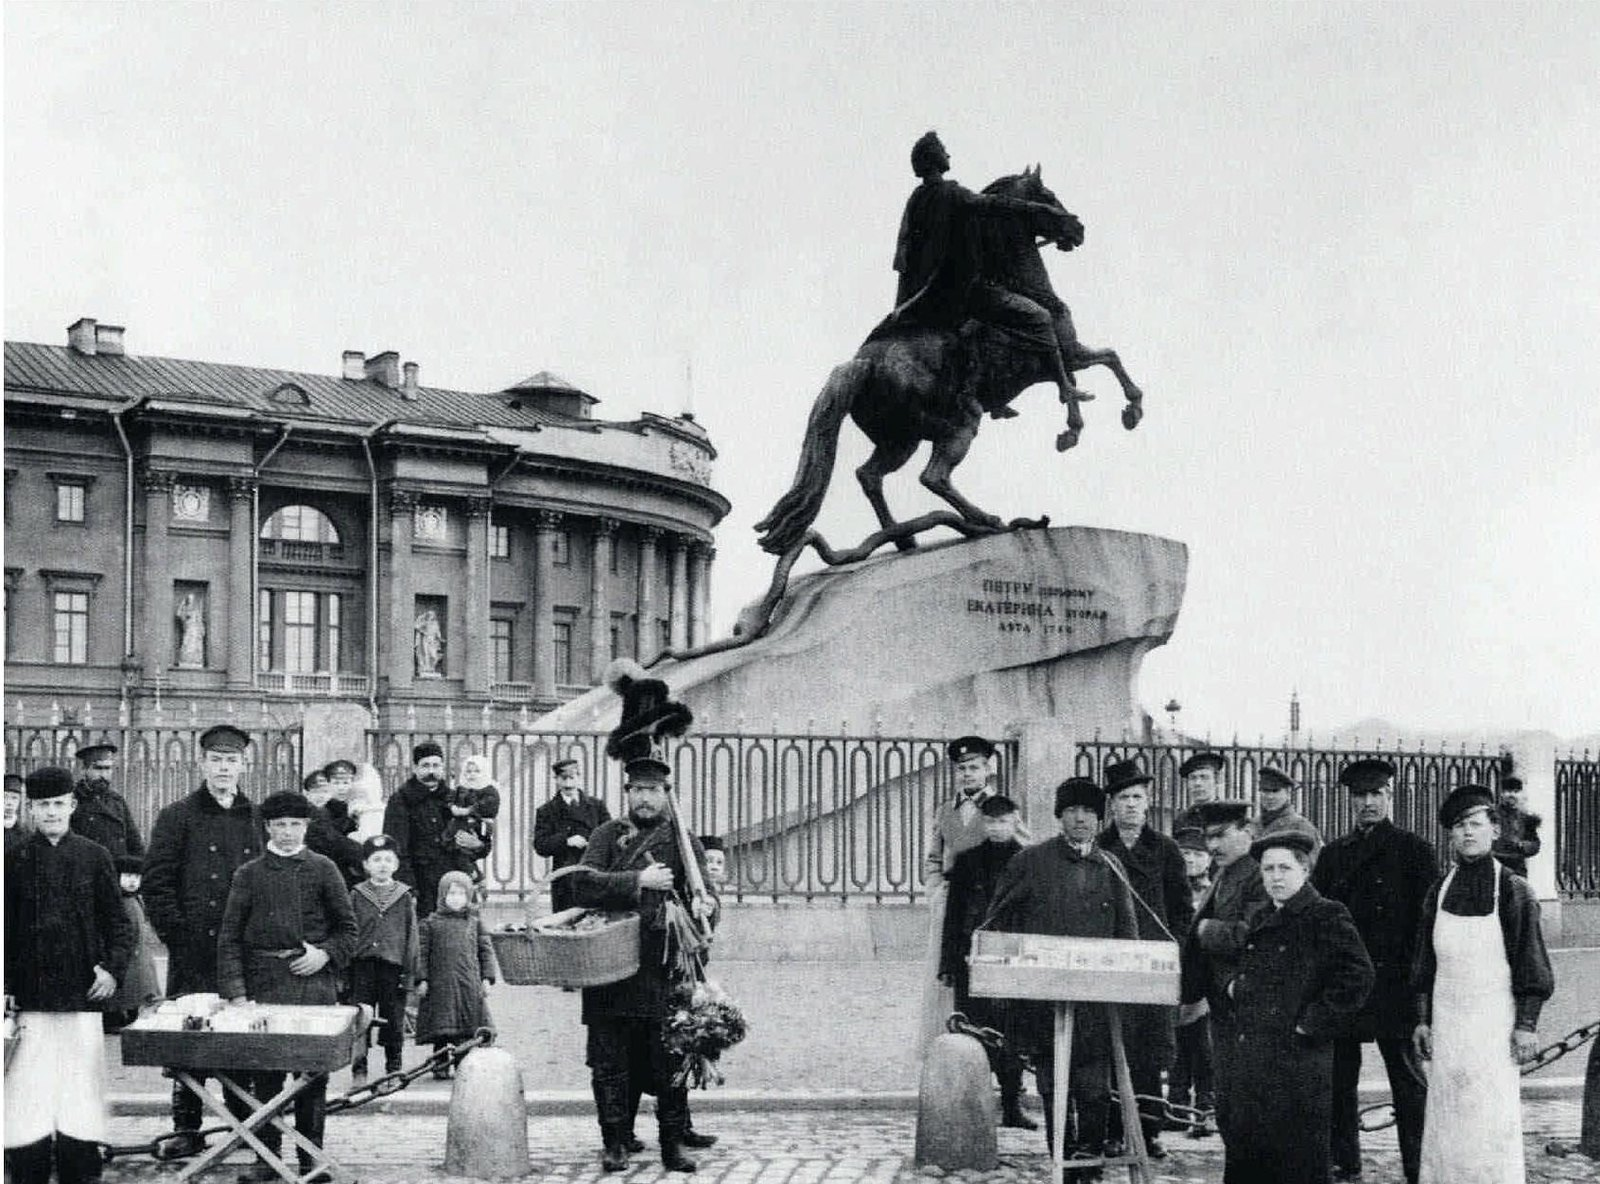 1910. Группа разносчиков у памятника Петру I на площади императора Петра I